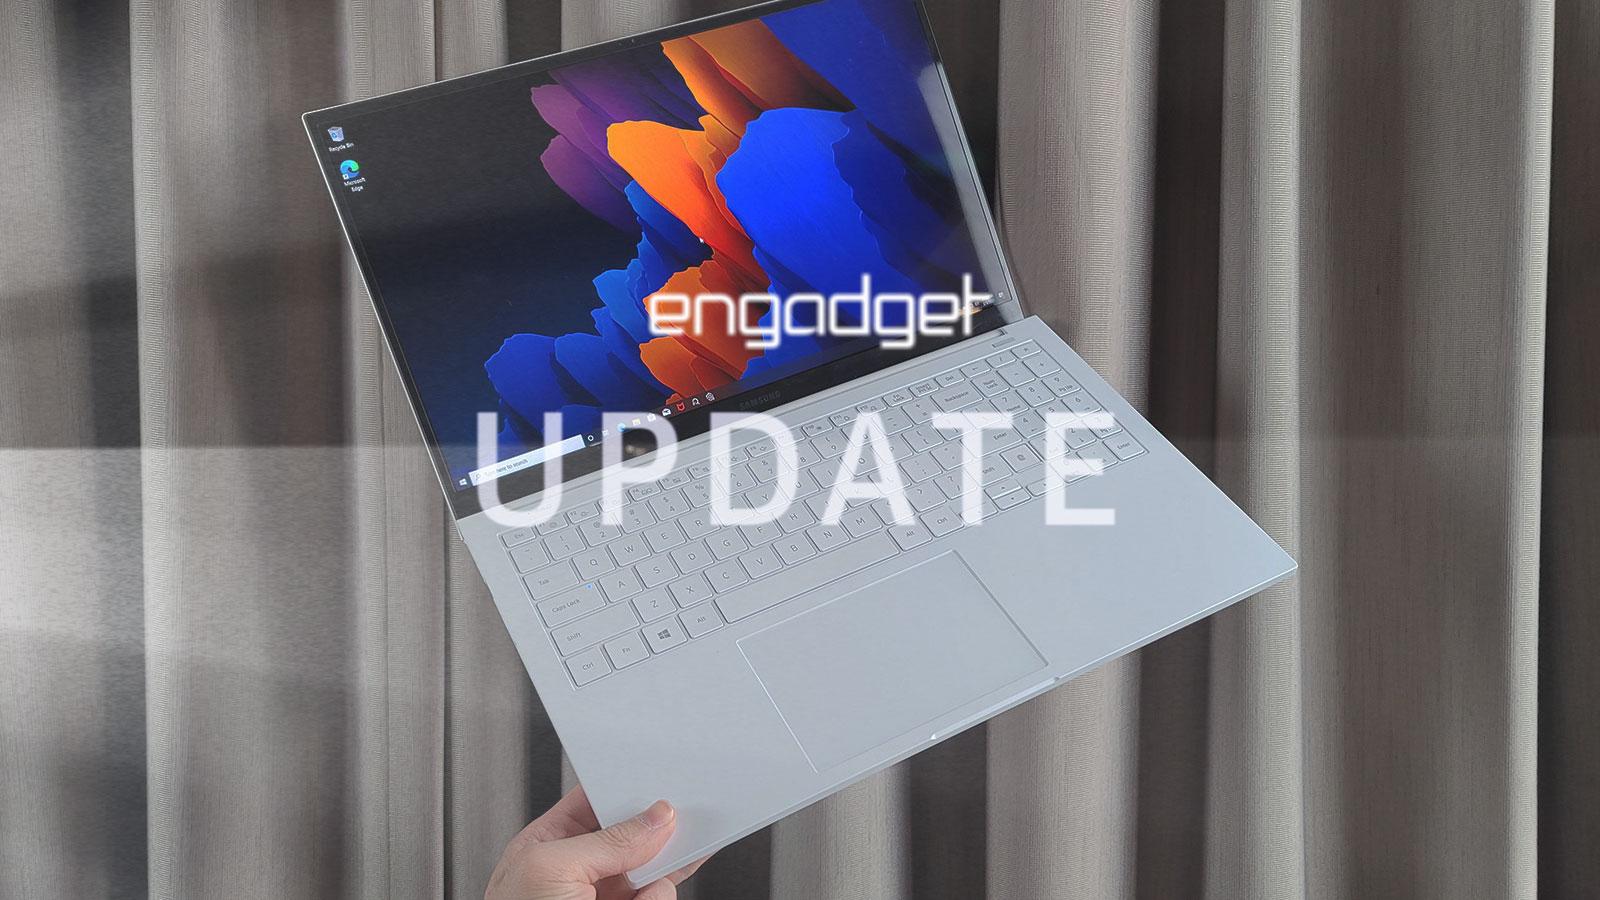 Engadget Update EP91